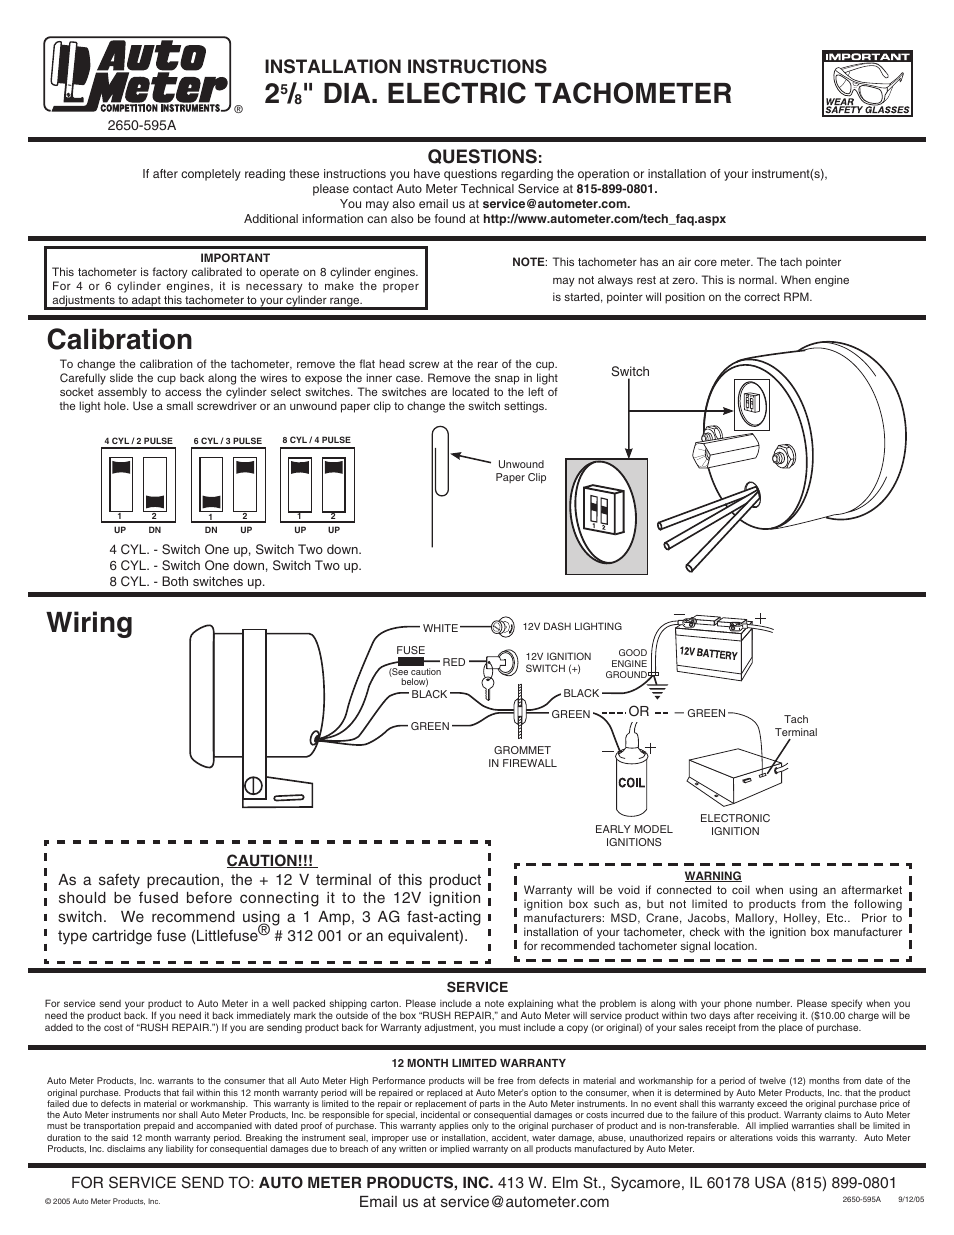 Wiring Diagram Auto Meter Tachometer Wiring Diagram Autometer Tach